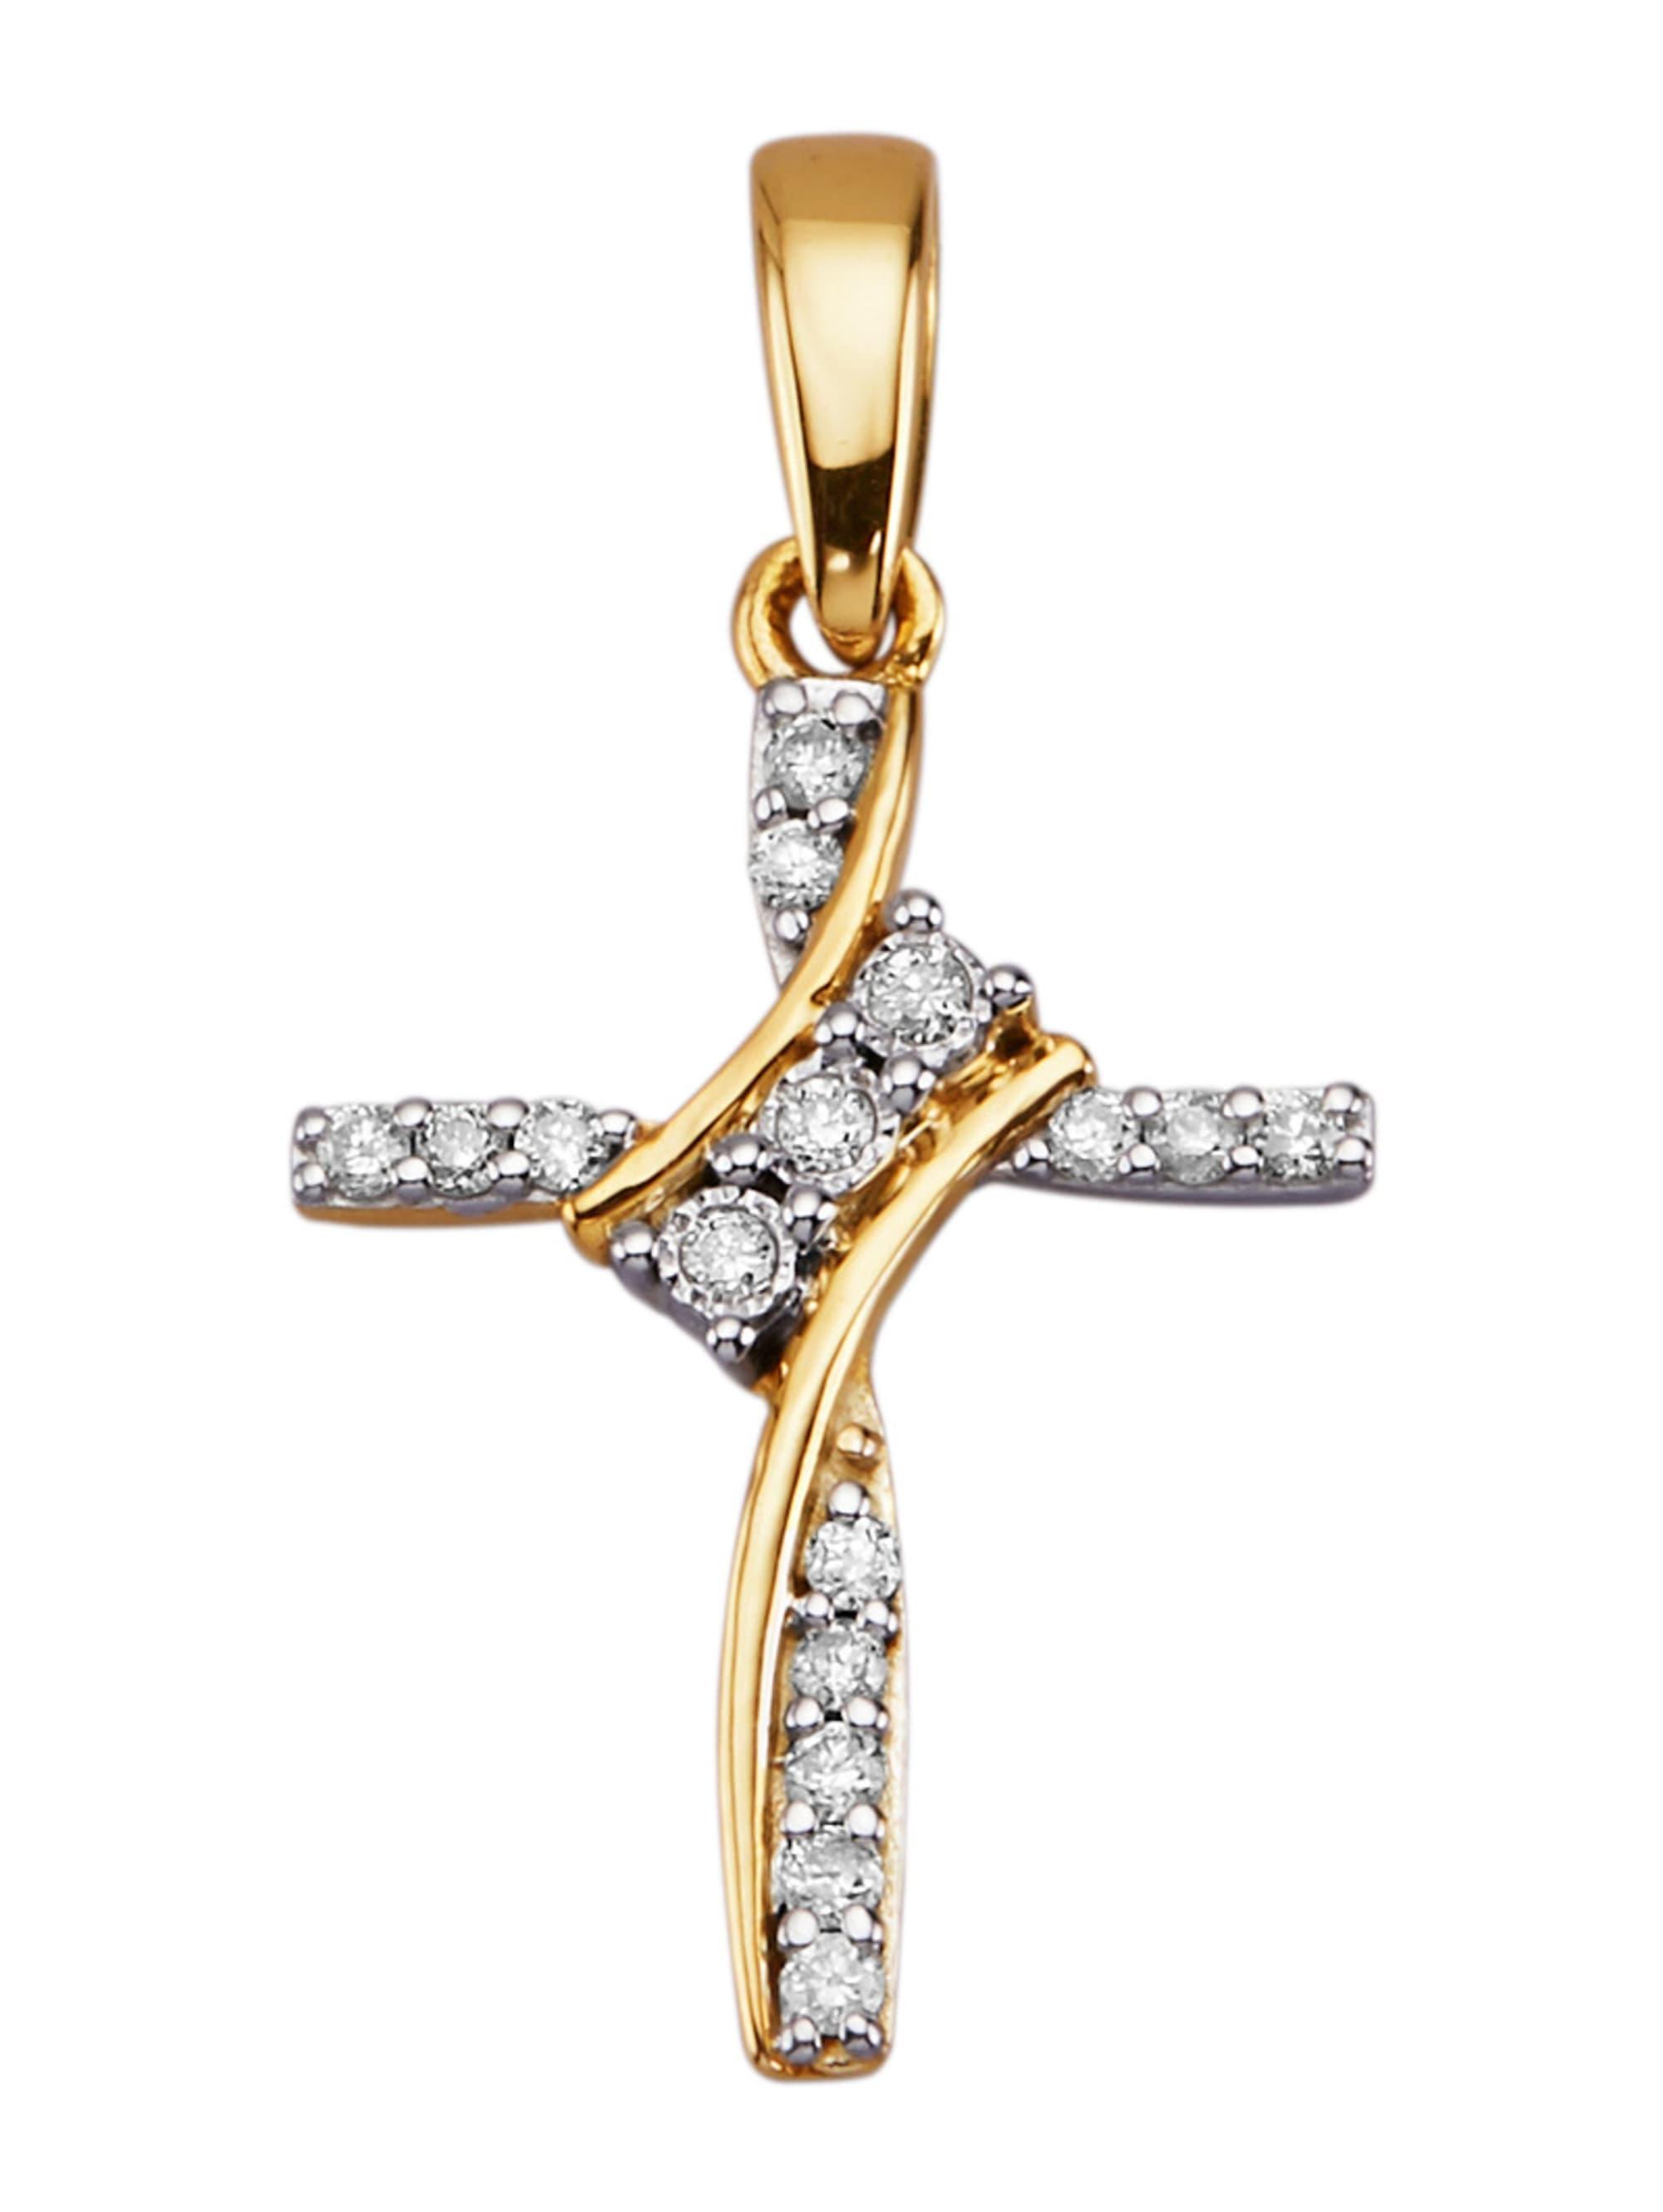 Kreuz-Anhänger mit Diamanten lkOJa